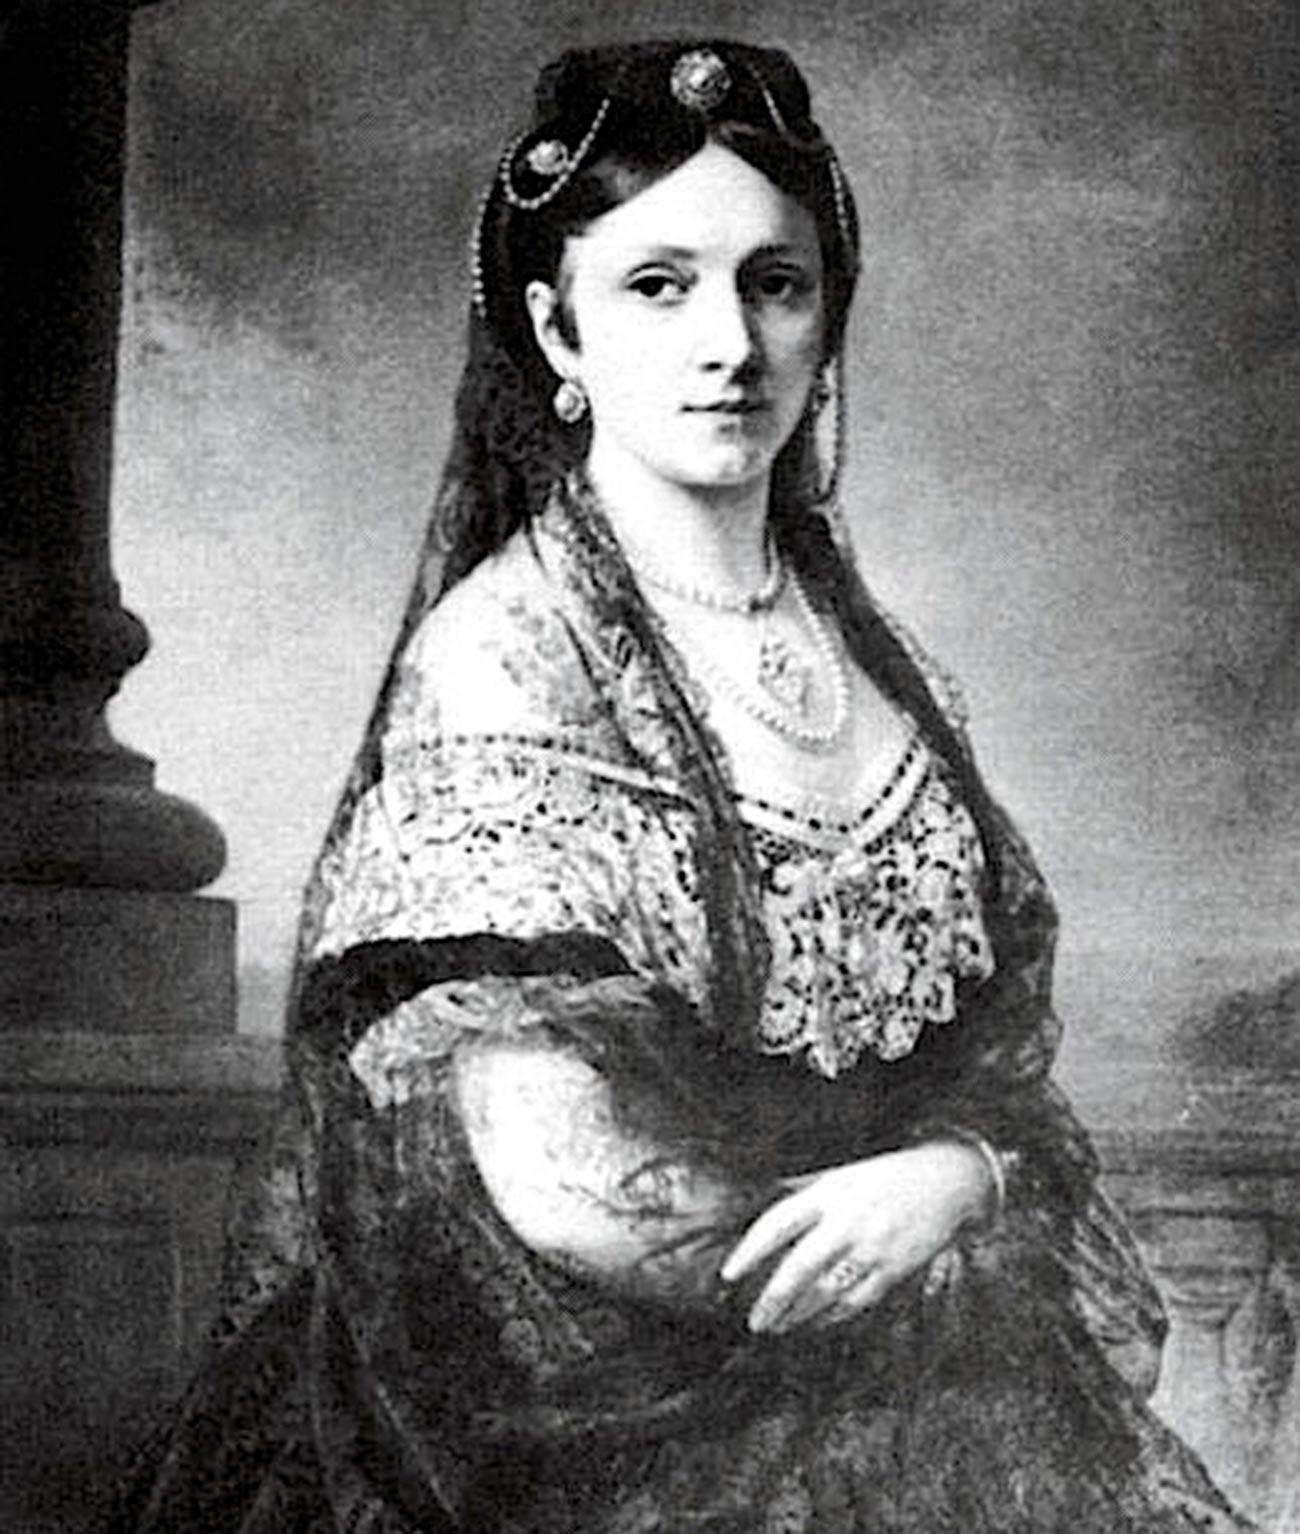 Portrait de Julia Hauke